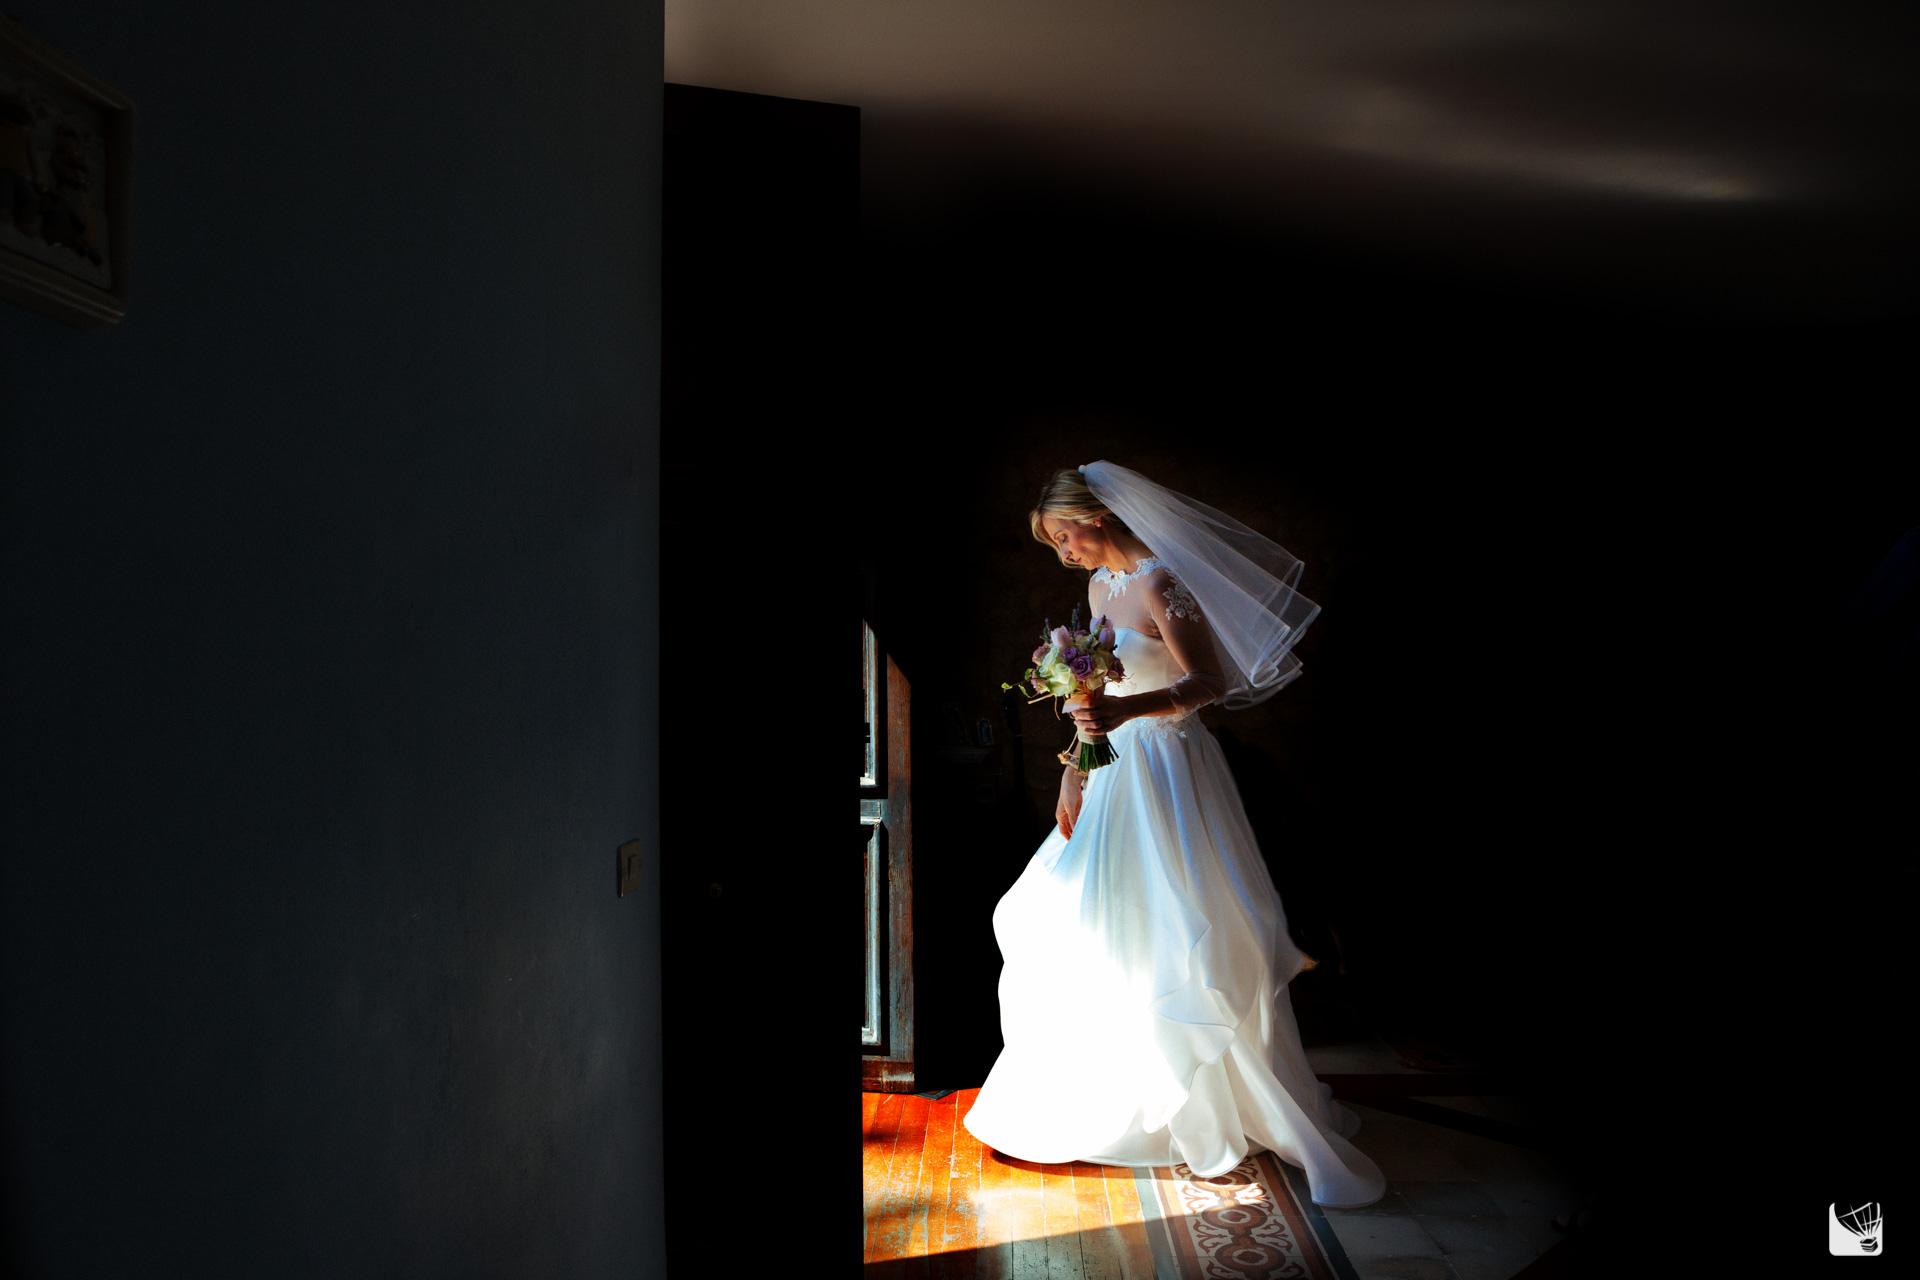 wedding_in_marzamemi-17.jpg